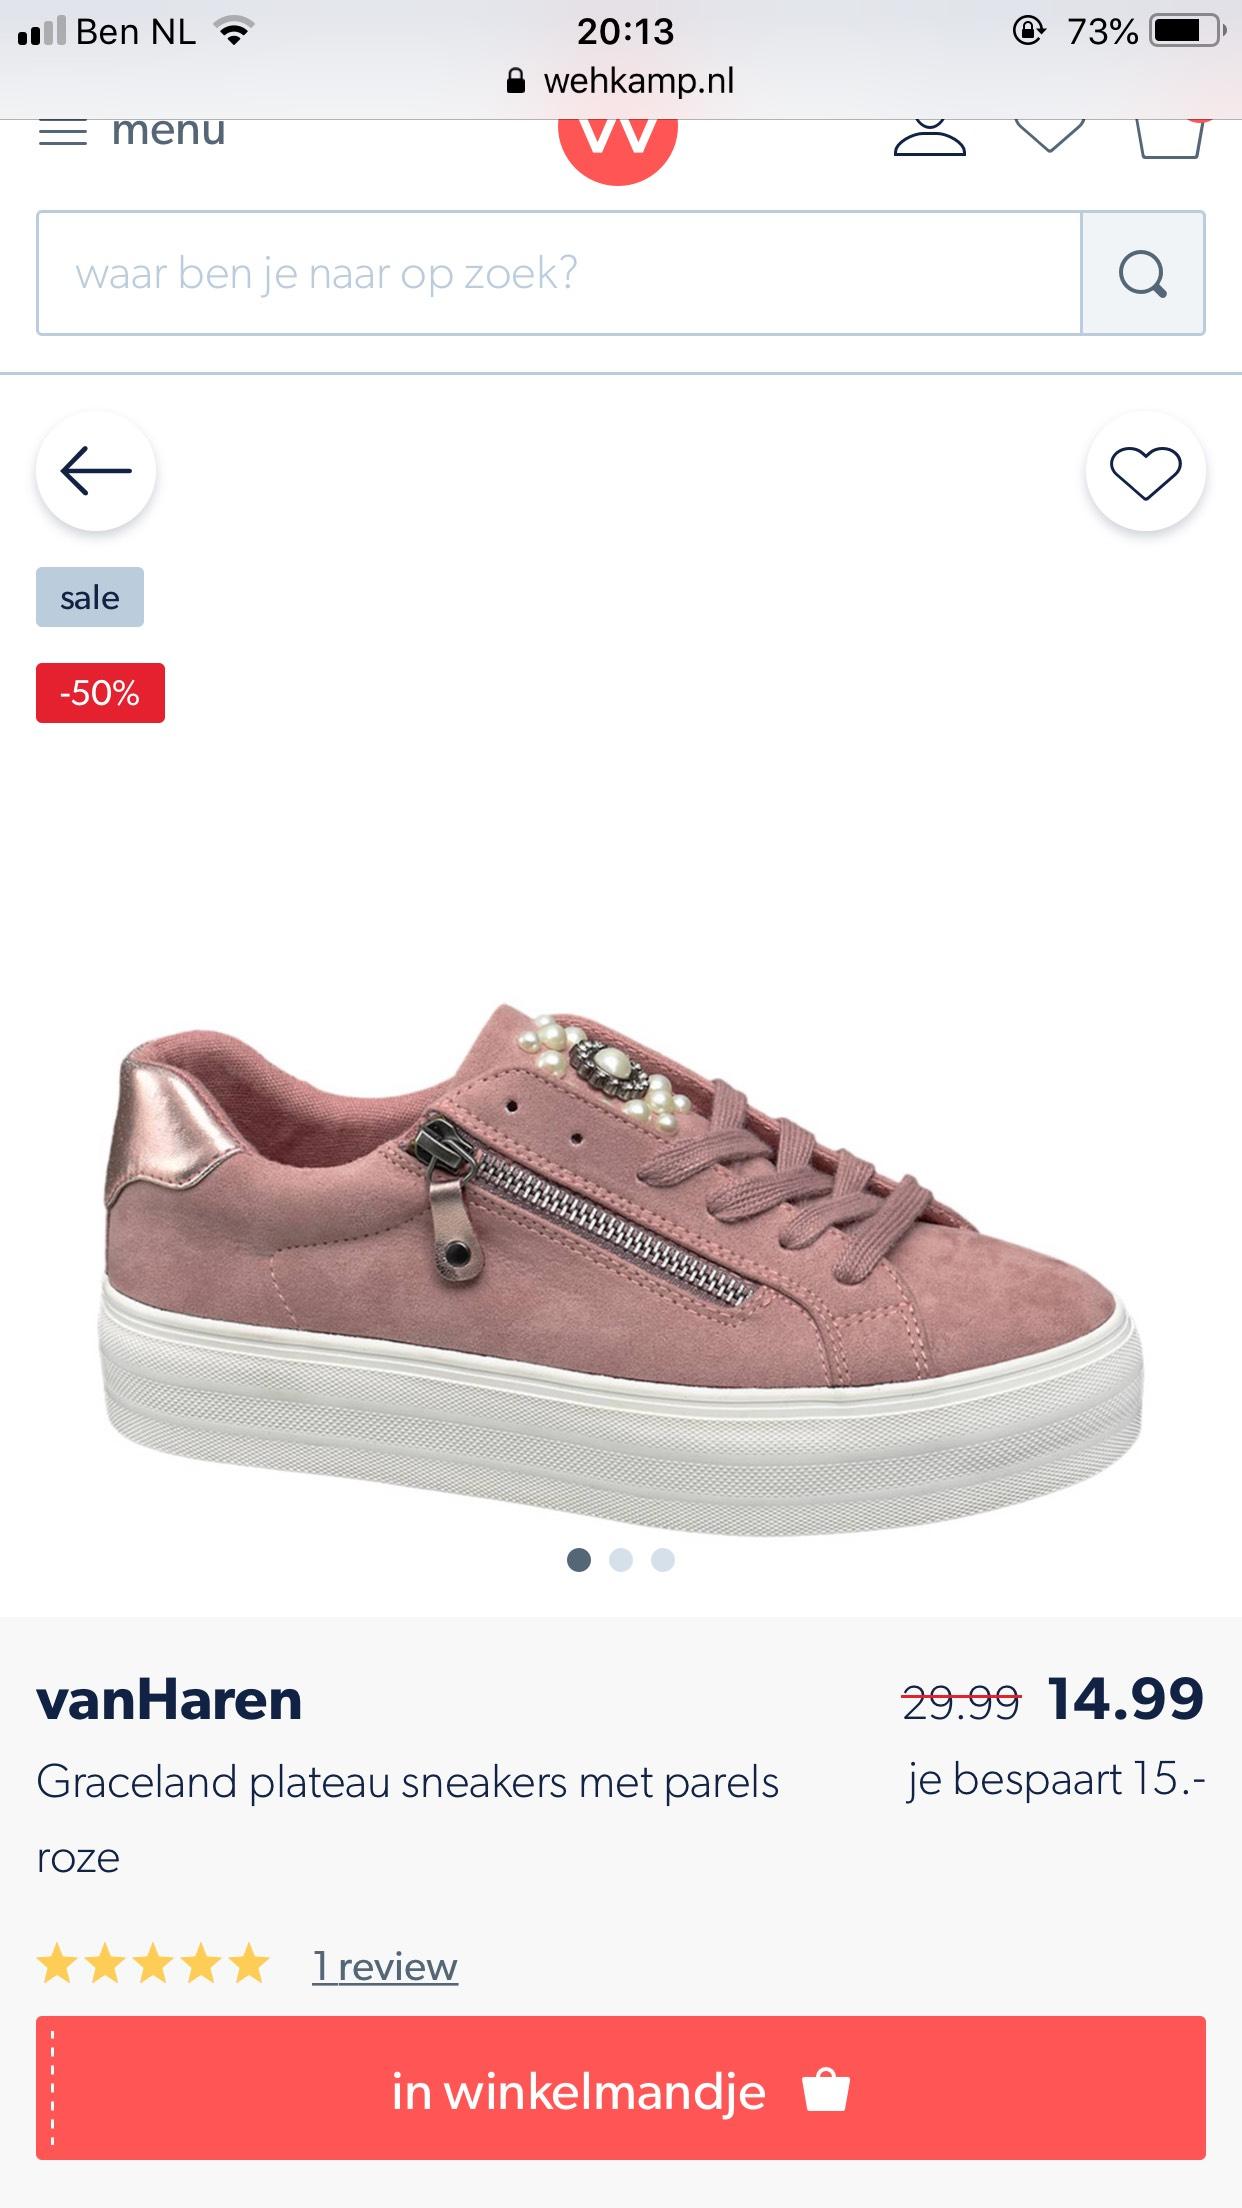 Van Haren dames sneakers parels 75% korting